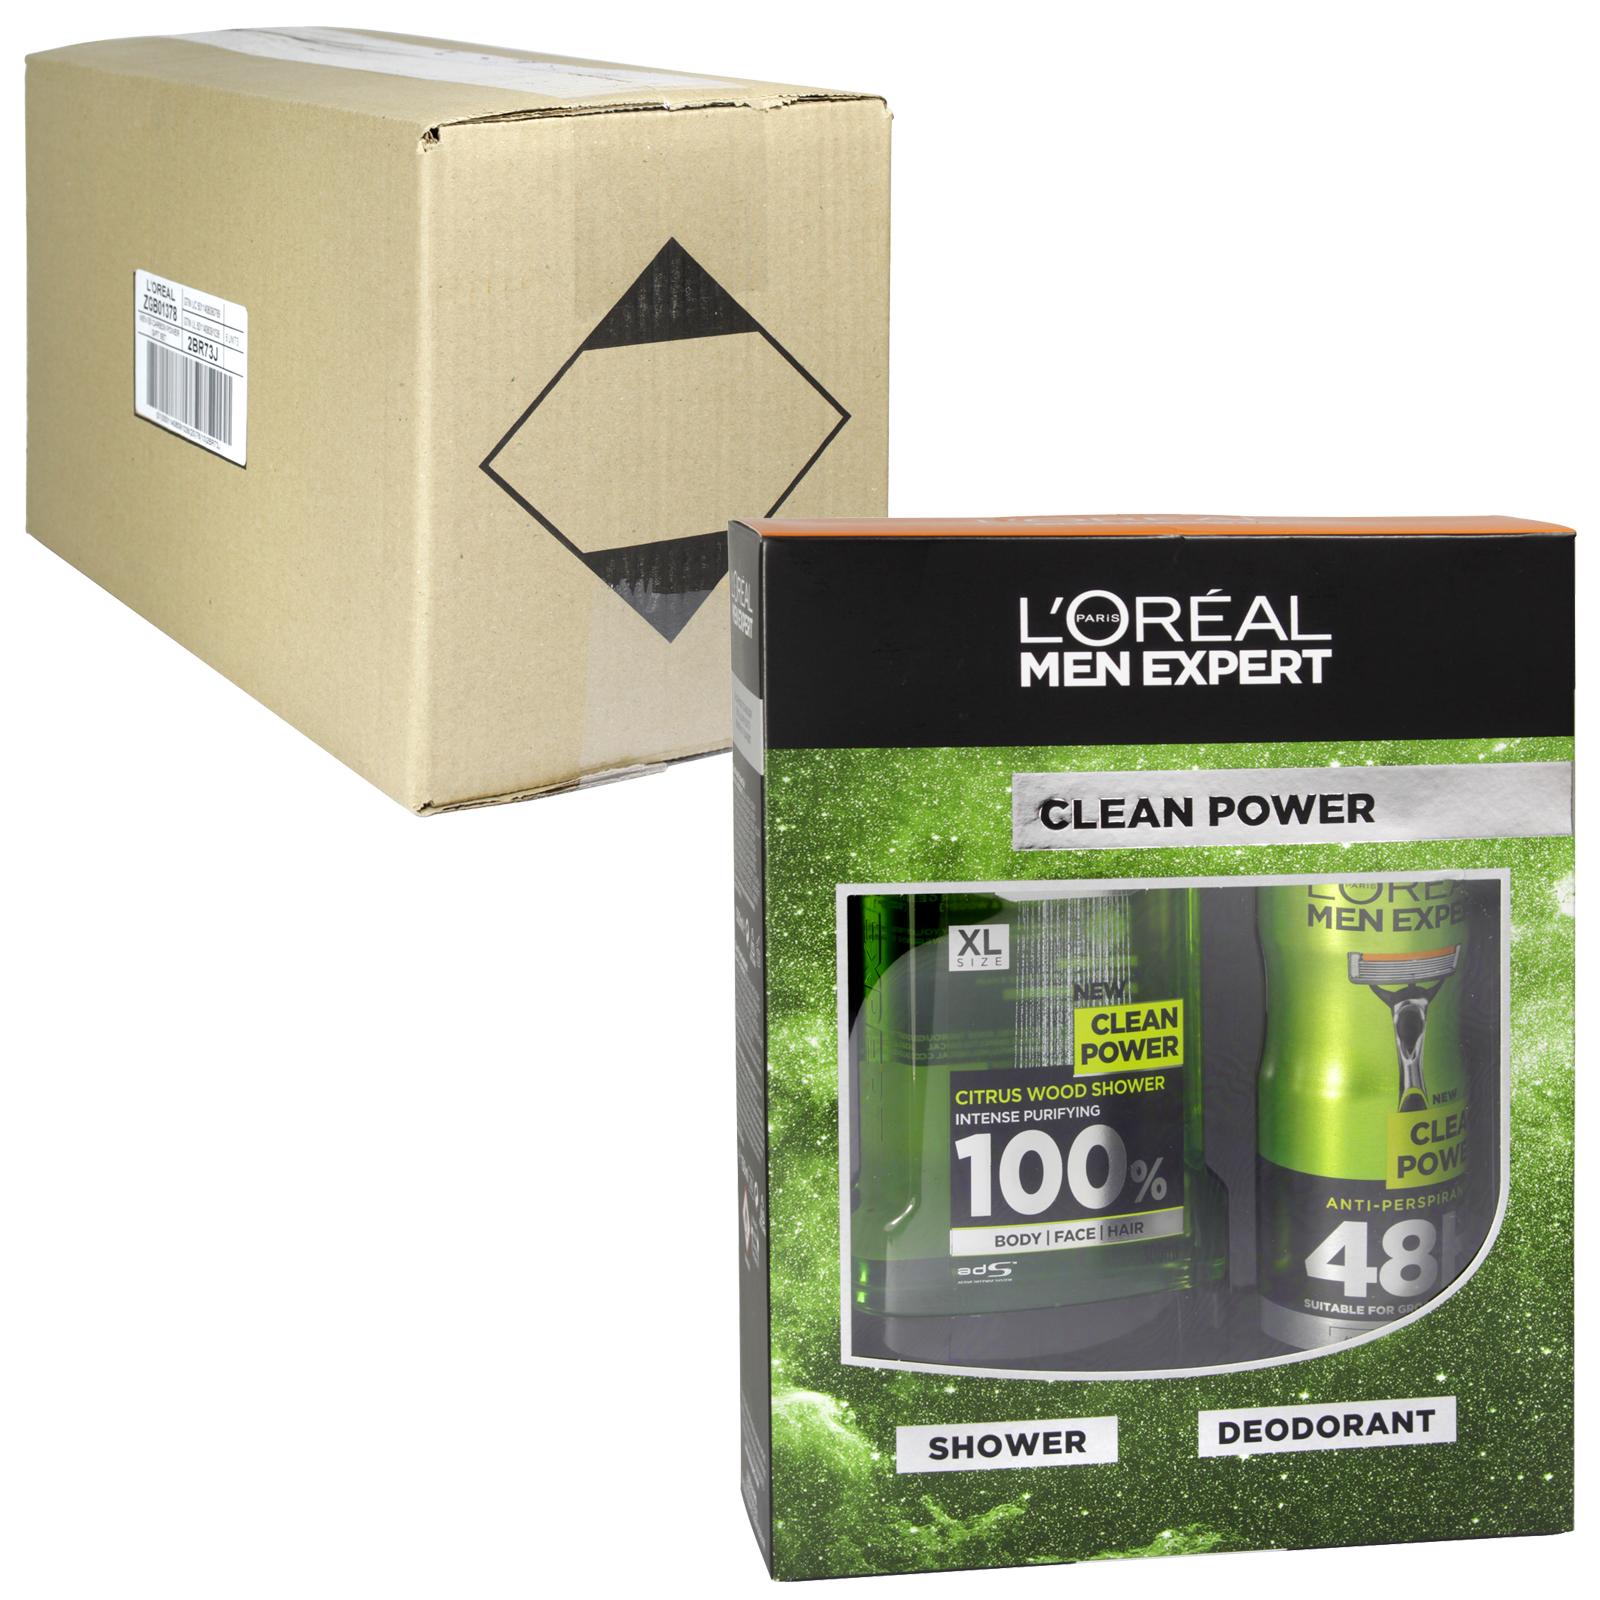 LOREAL MEN EXPERT 300ML SHOWER GEL+150ML DEOD CLEAN POWER X6